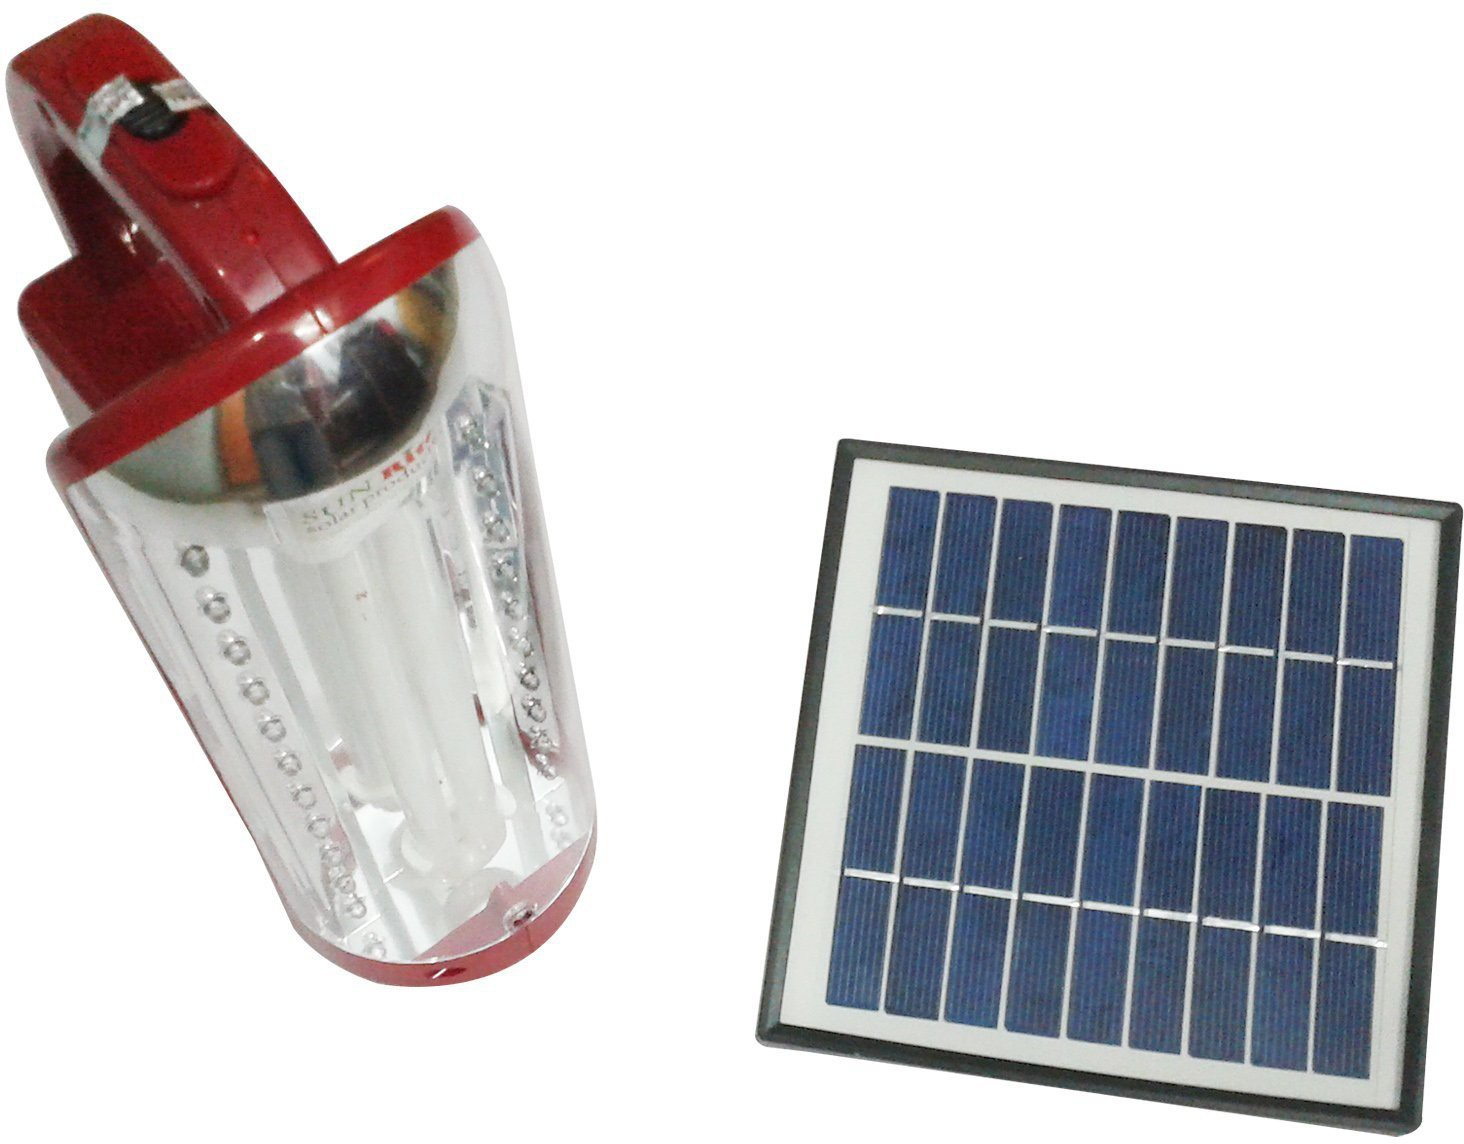 Sun Rite Solar Bright Emergency Lights